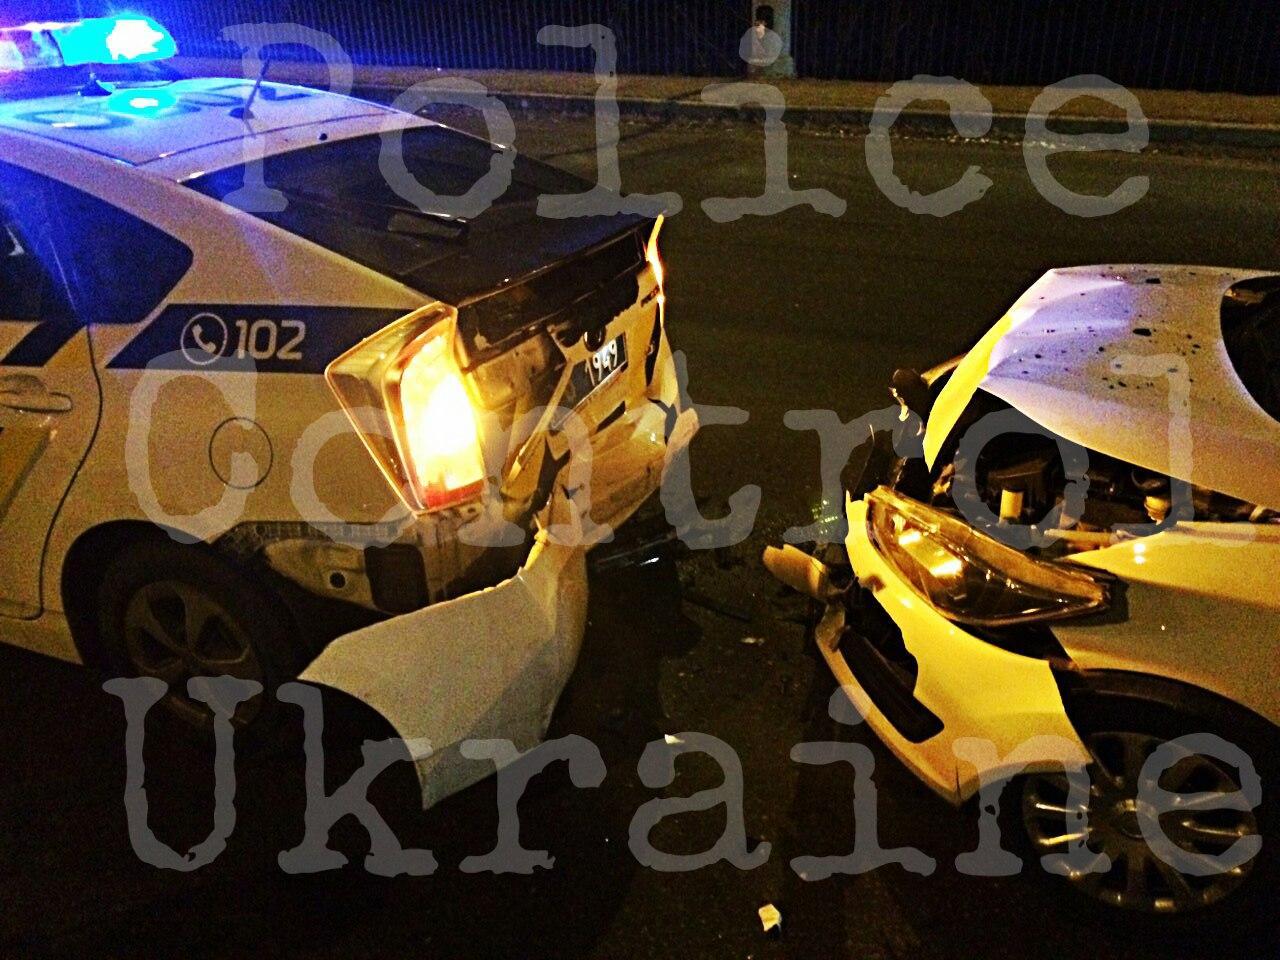 На Салтівці патрульна машина потрапила в ДТП (ФОТО, ВІДЕО) - фото 1